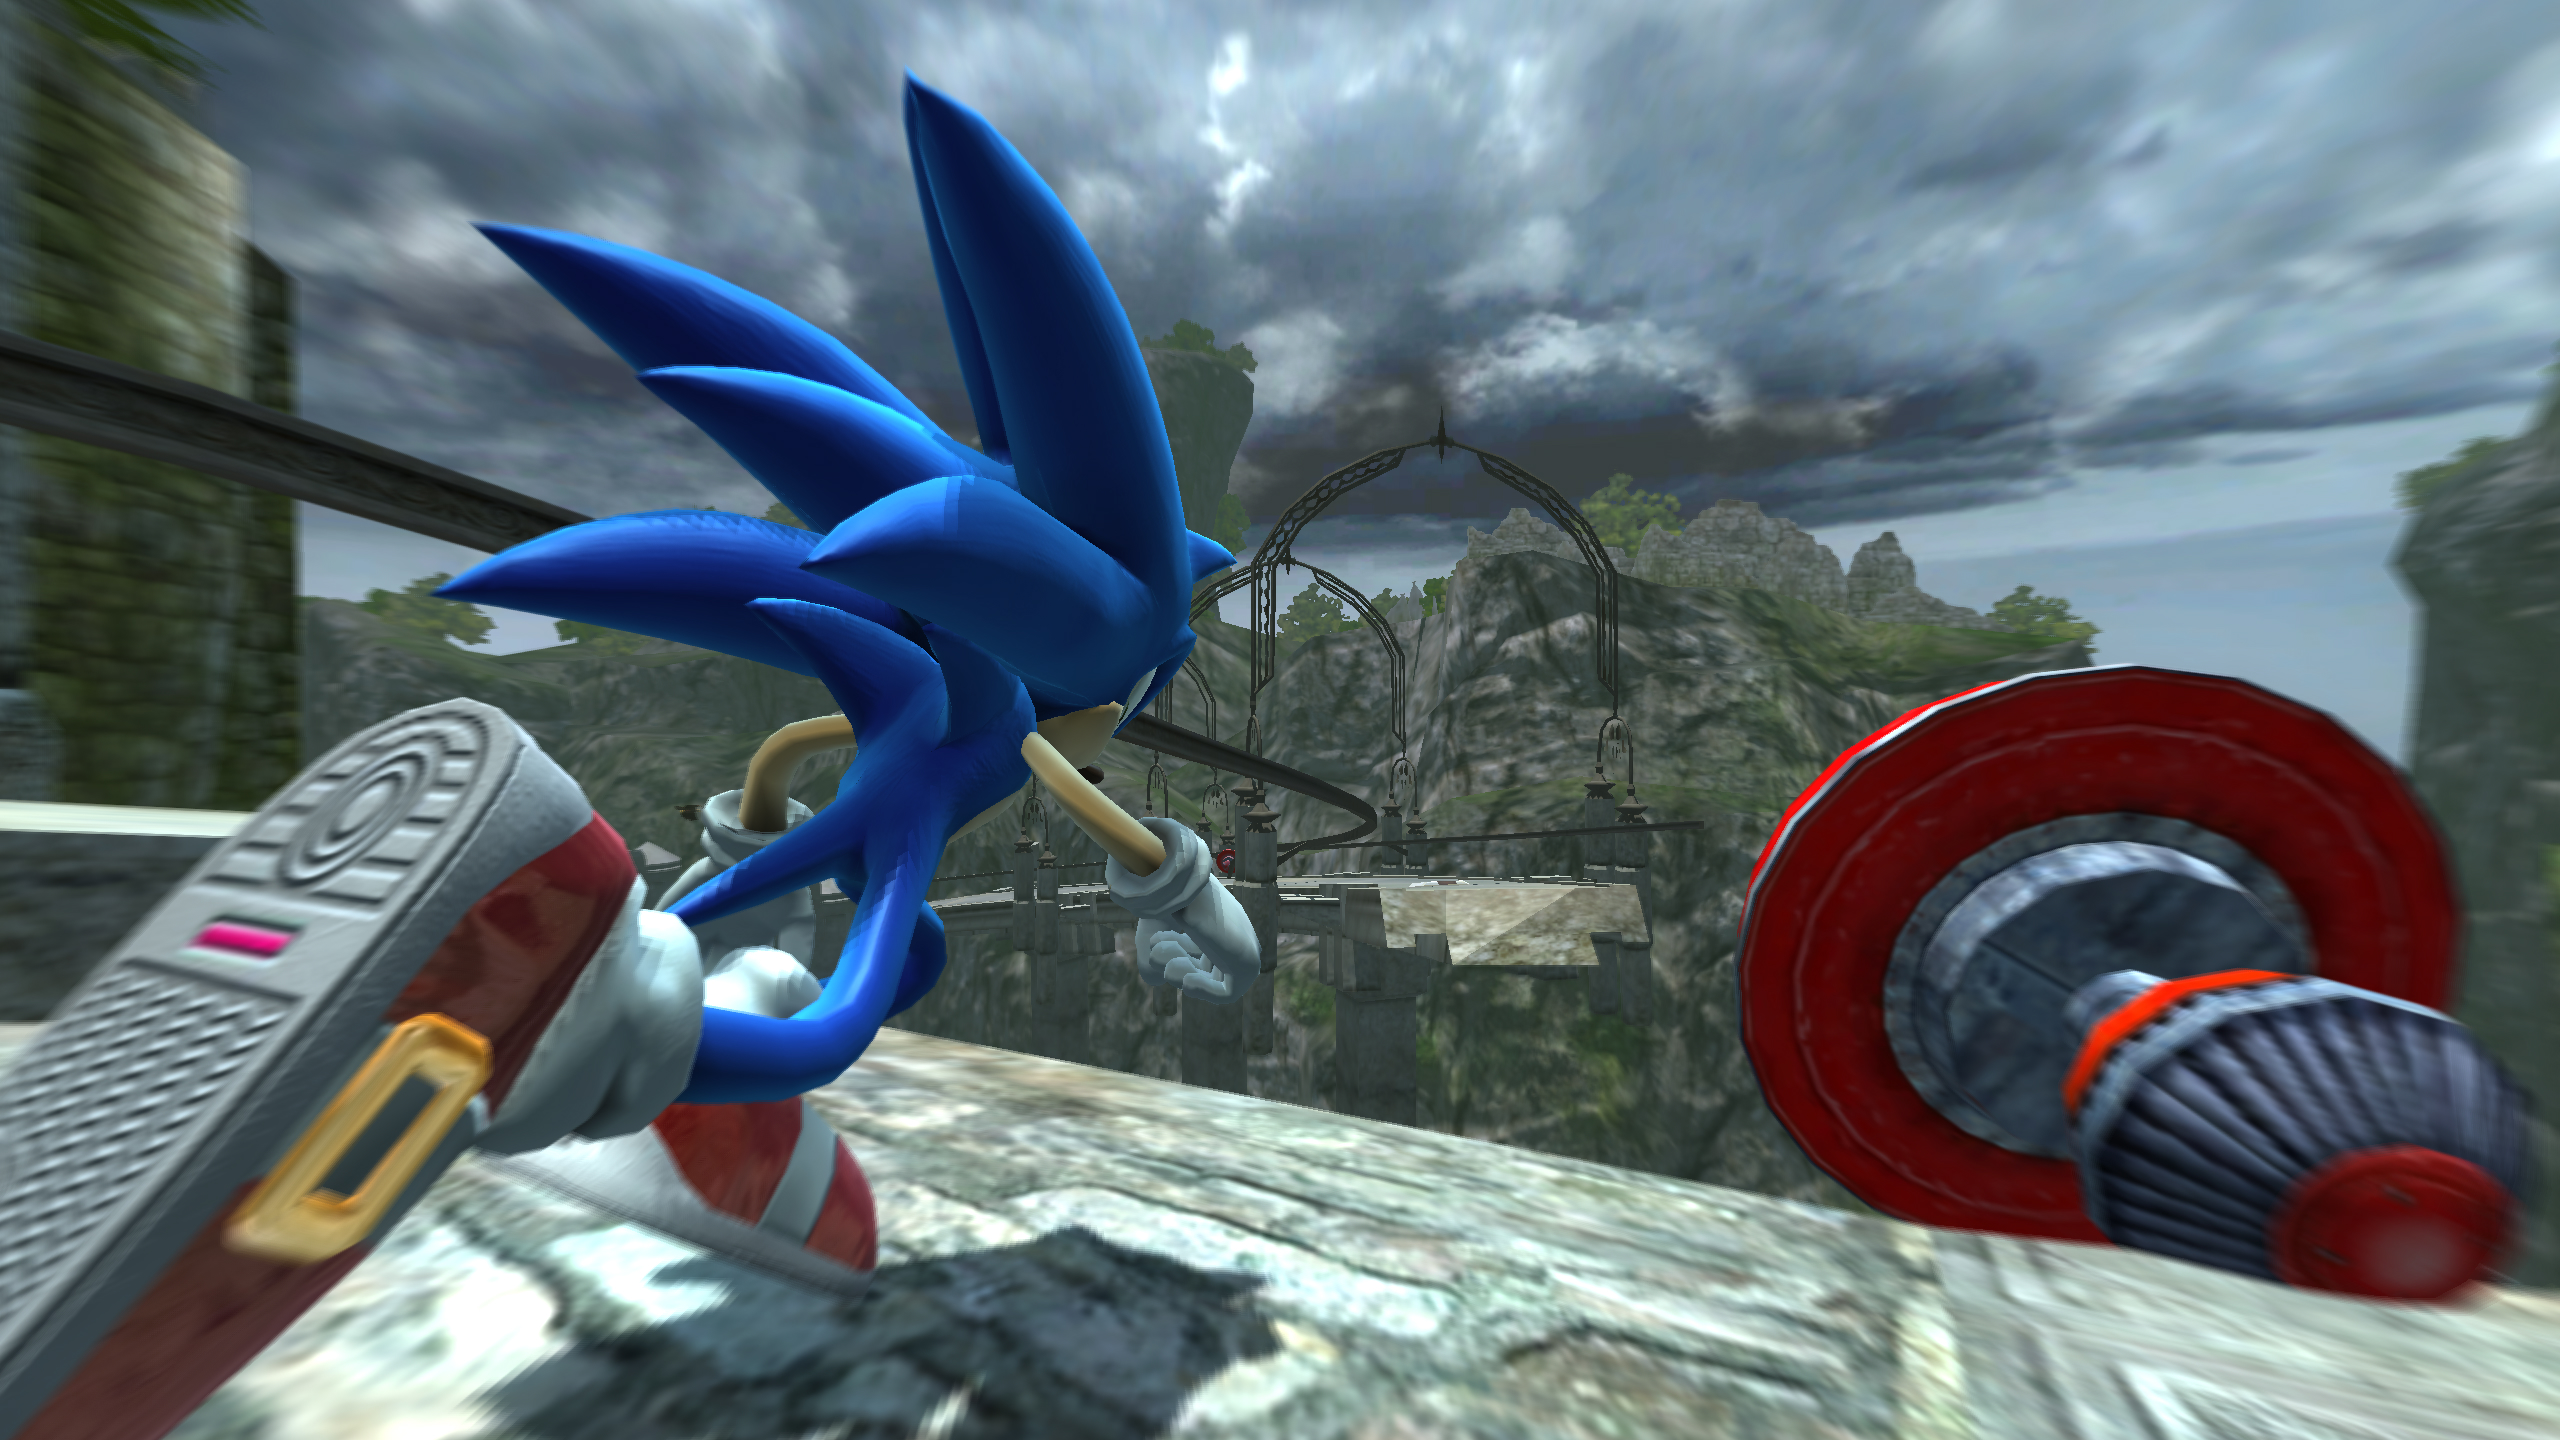 File:Sonic06screen9.jpg